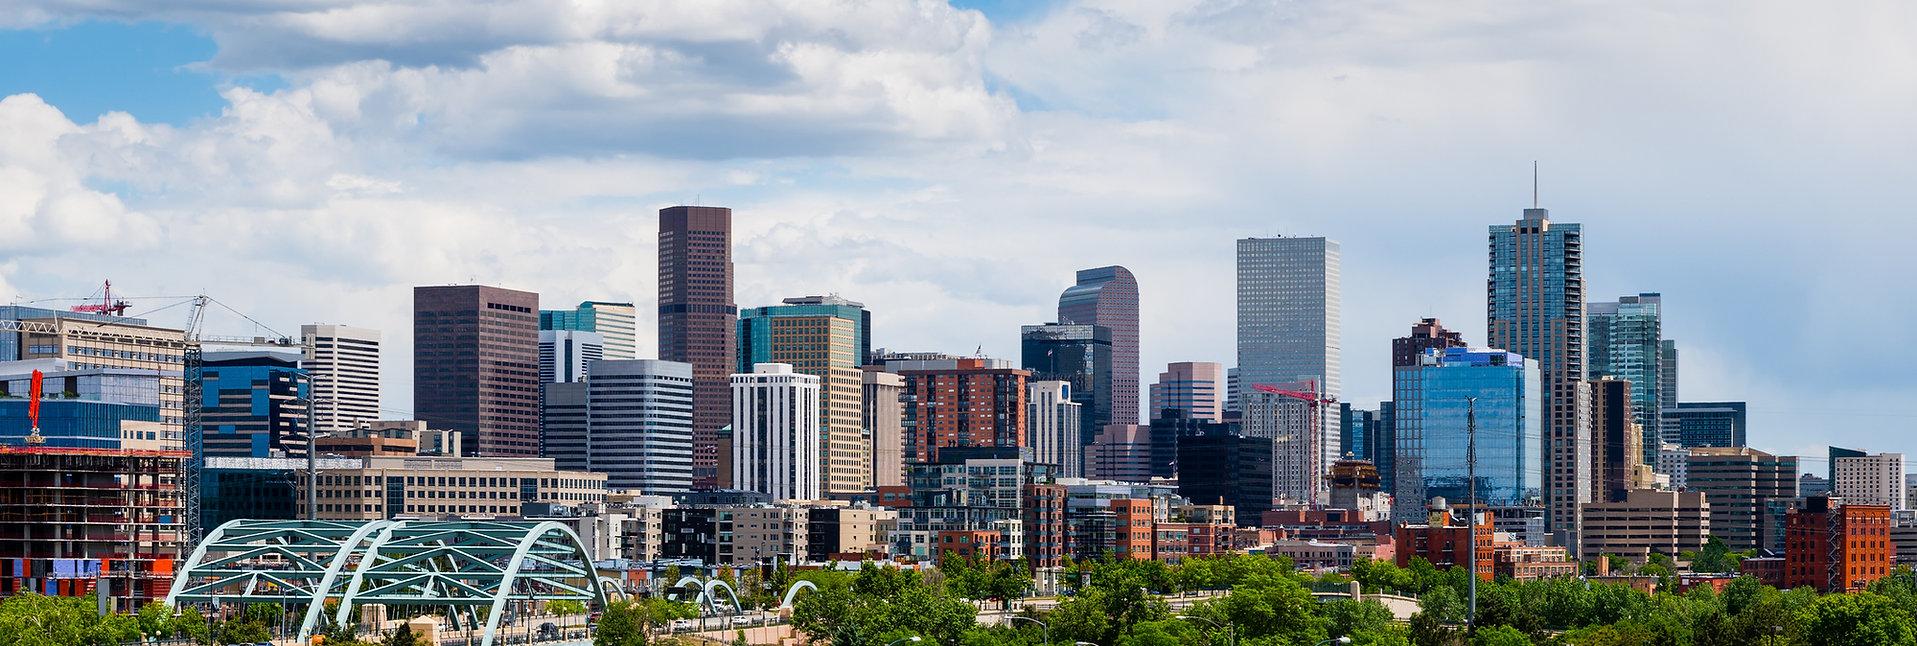 Denver City Horizon View.jpg